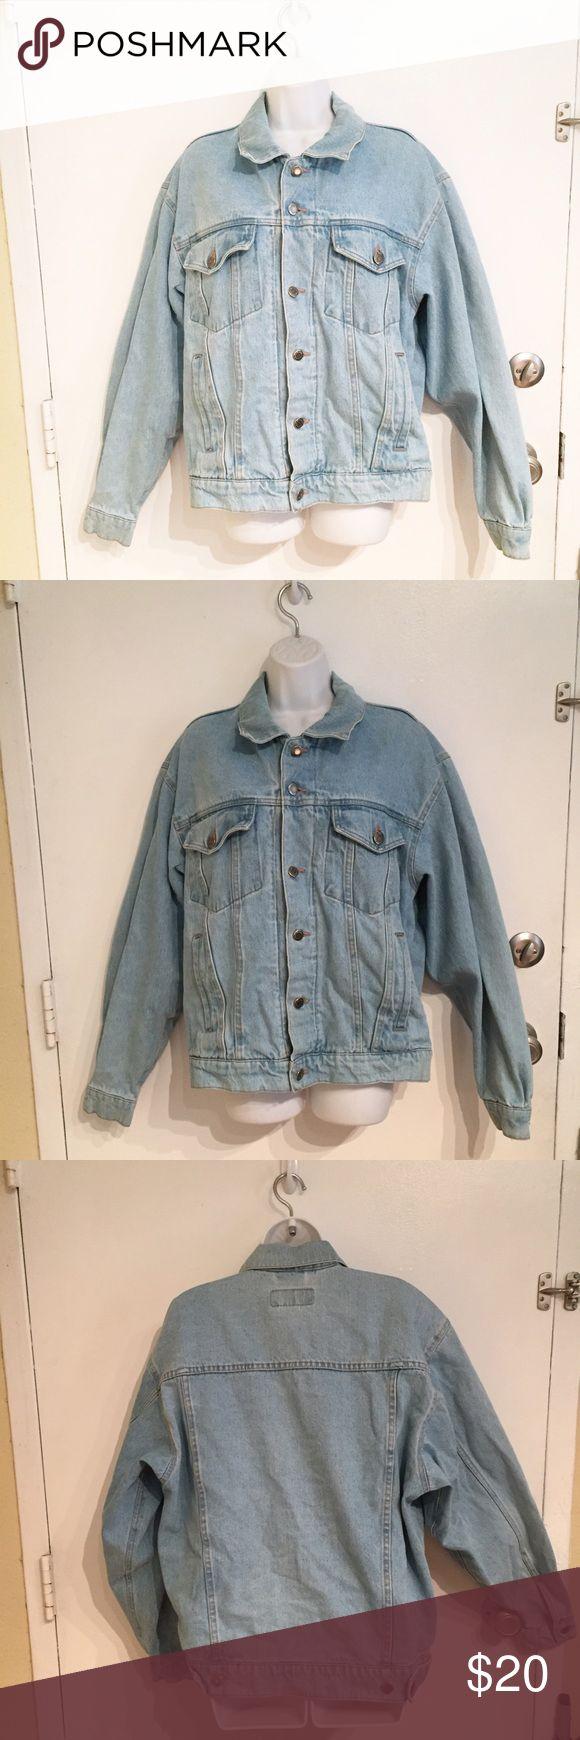 "Wrangler Classic Light Wash Denim Jacket Classic light wash ""worn in"" Denim jacket by Wrangler. Men's medium but could be worn oversized as a women's. Smoke free home. Wrangler Jackets & Coats"